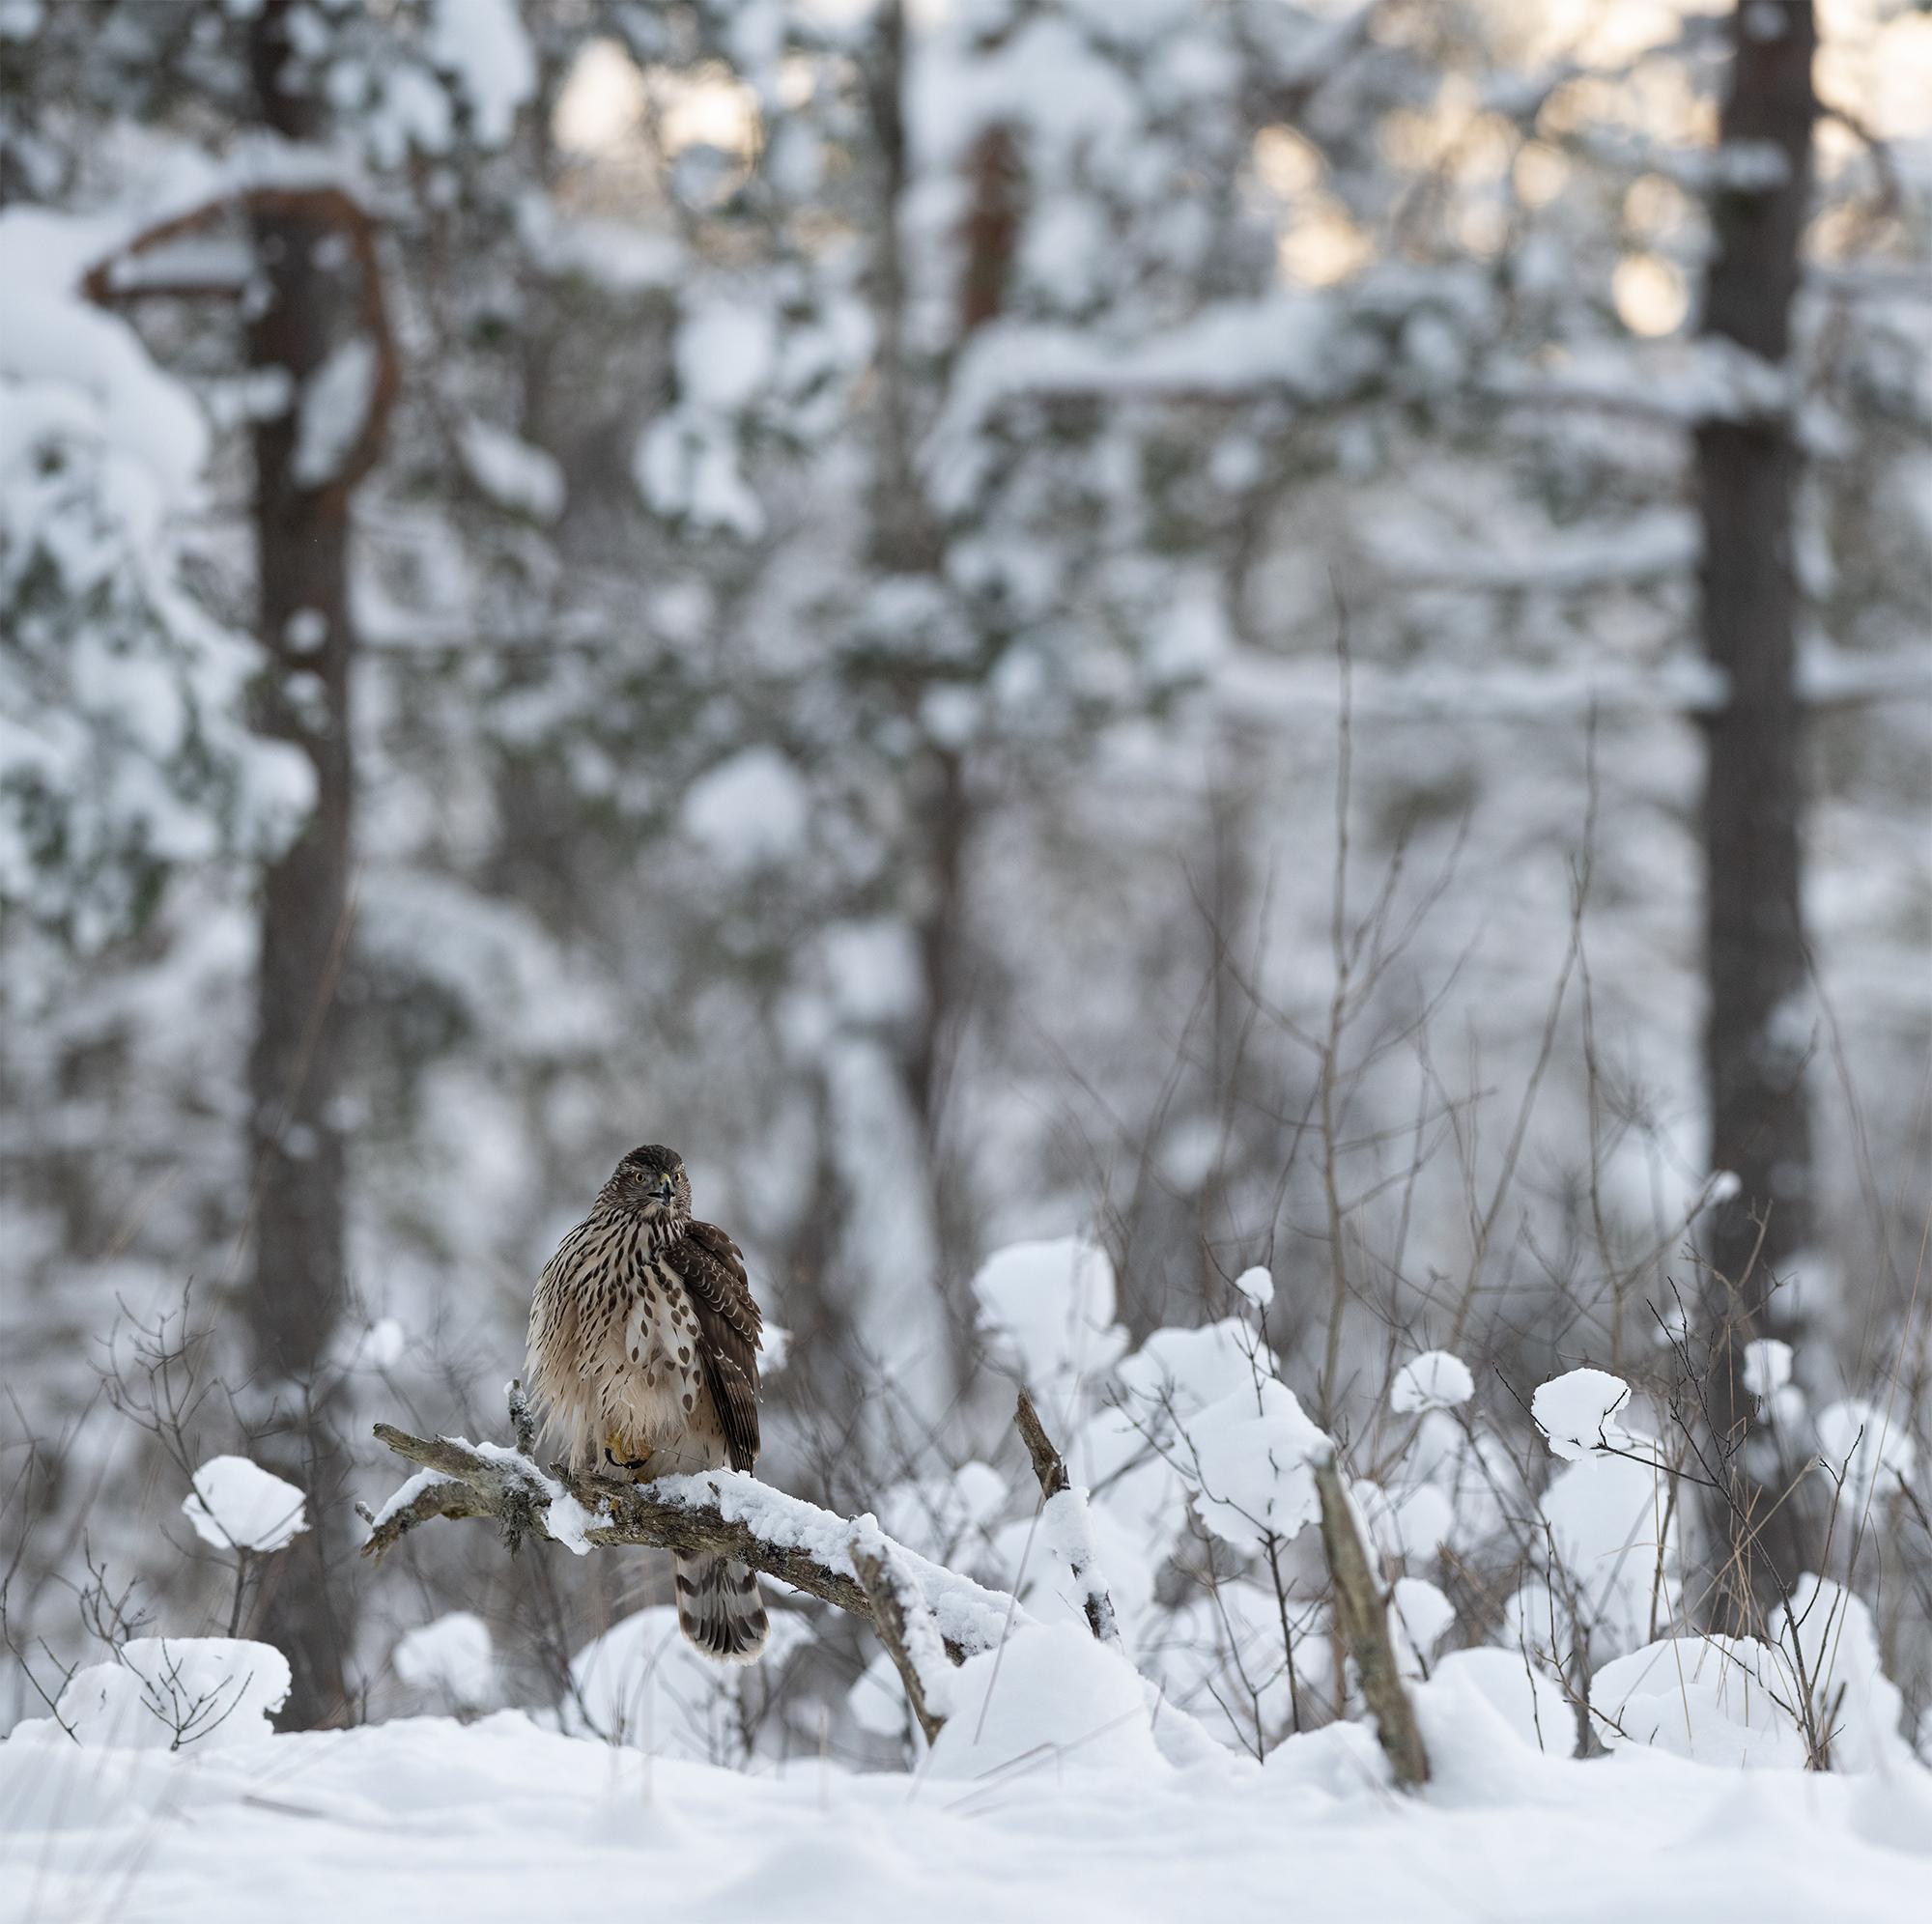 Kanakull talvises metsas